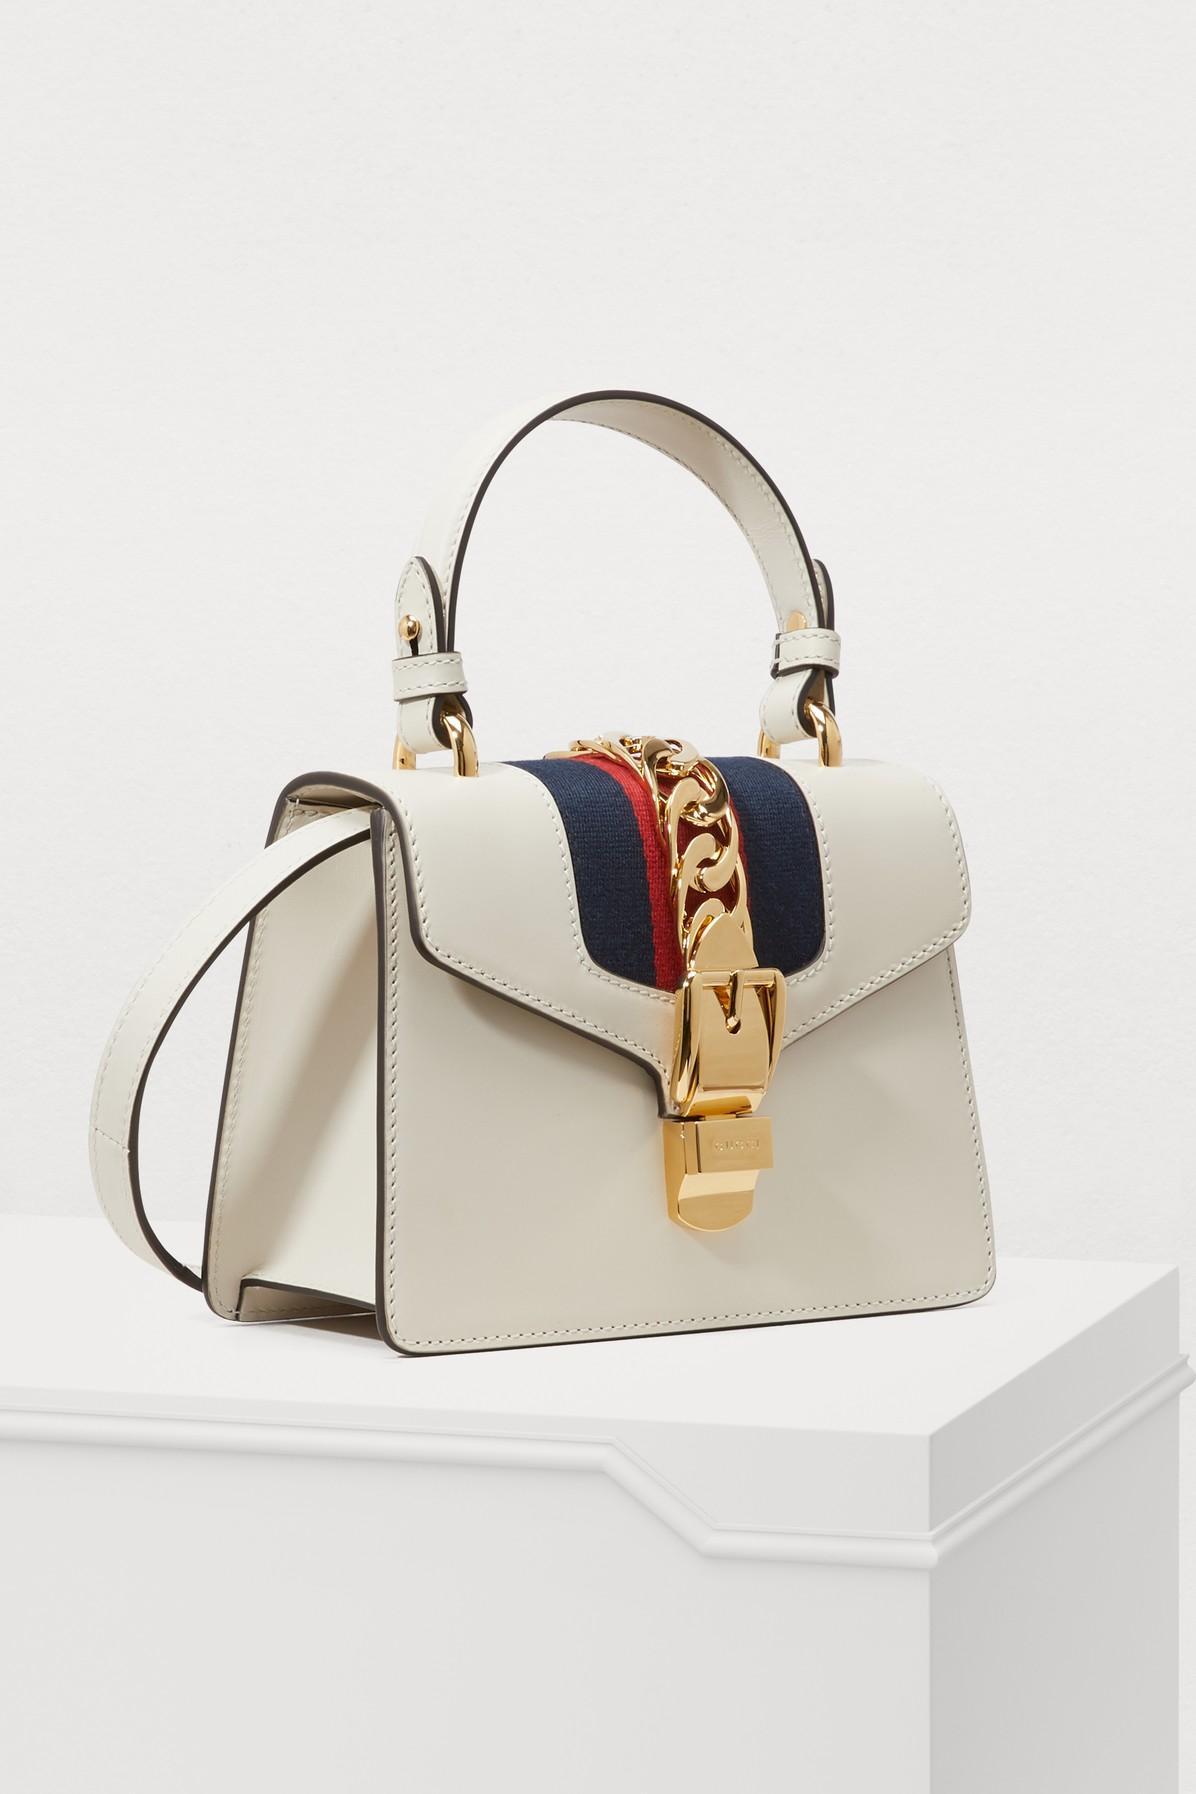 a5407f59be16 Gucci White Handbag - Foto Handbag All Collections Salonagafiya.Com